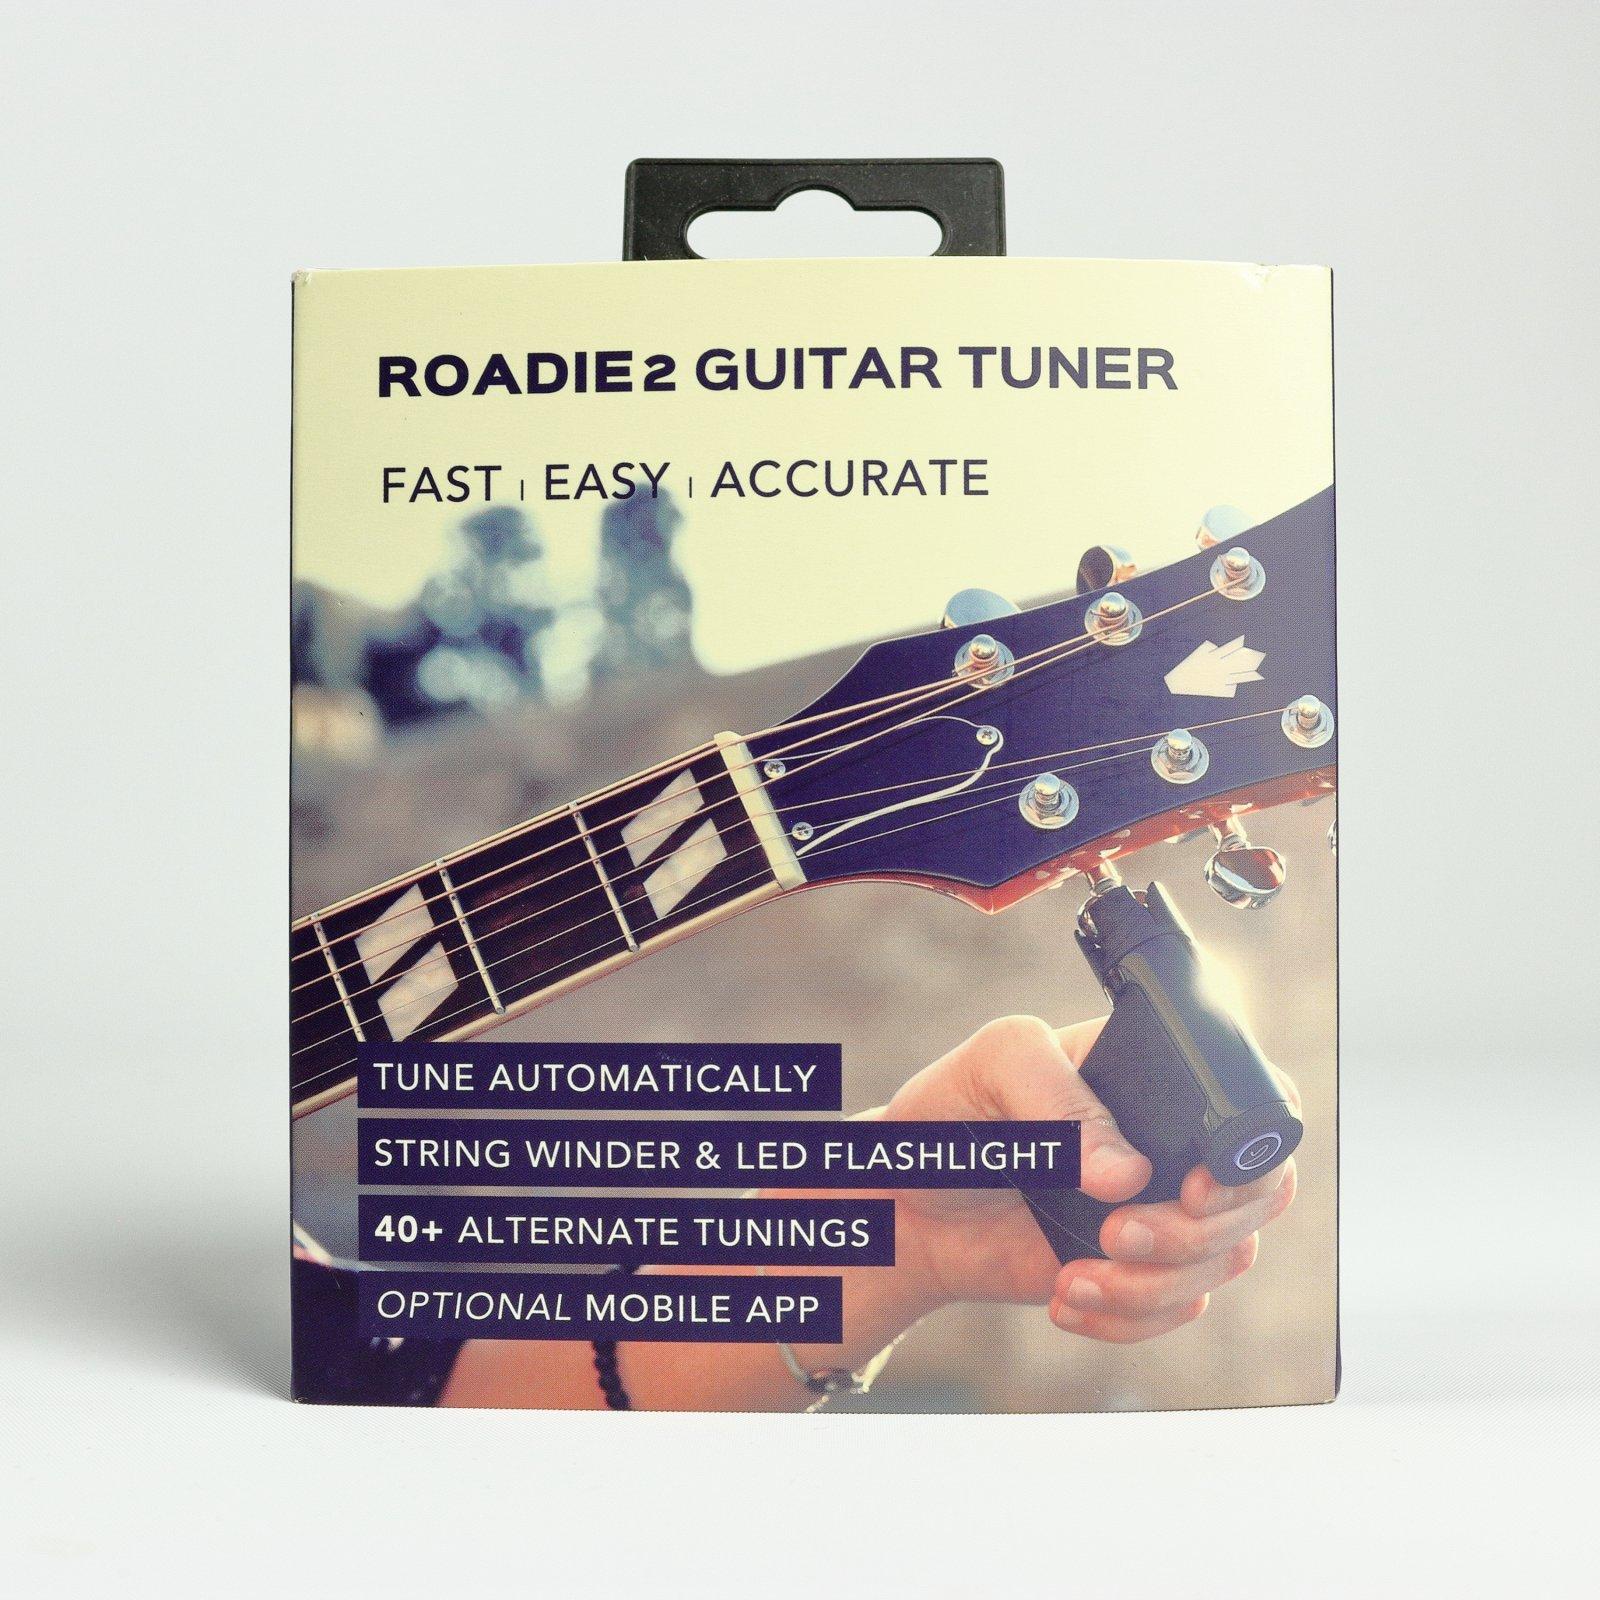 Roadie 2 Automatic Guitar Tuner